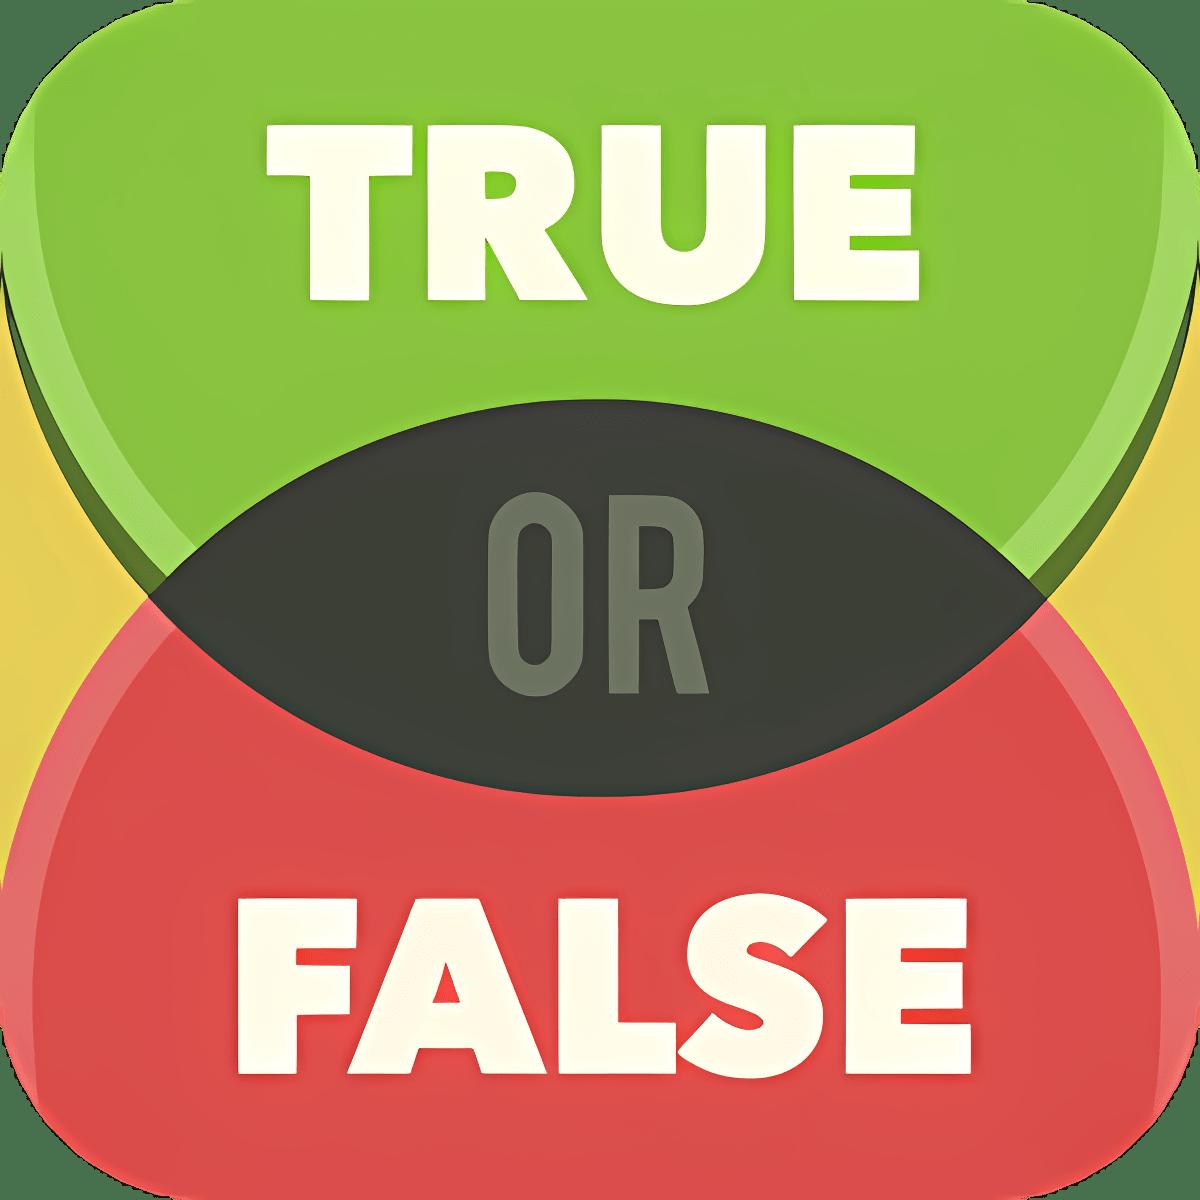 Cierto o falso